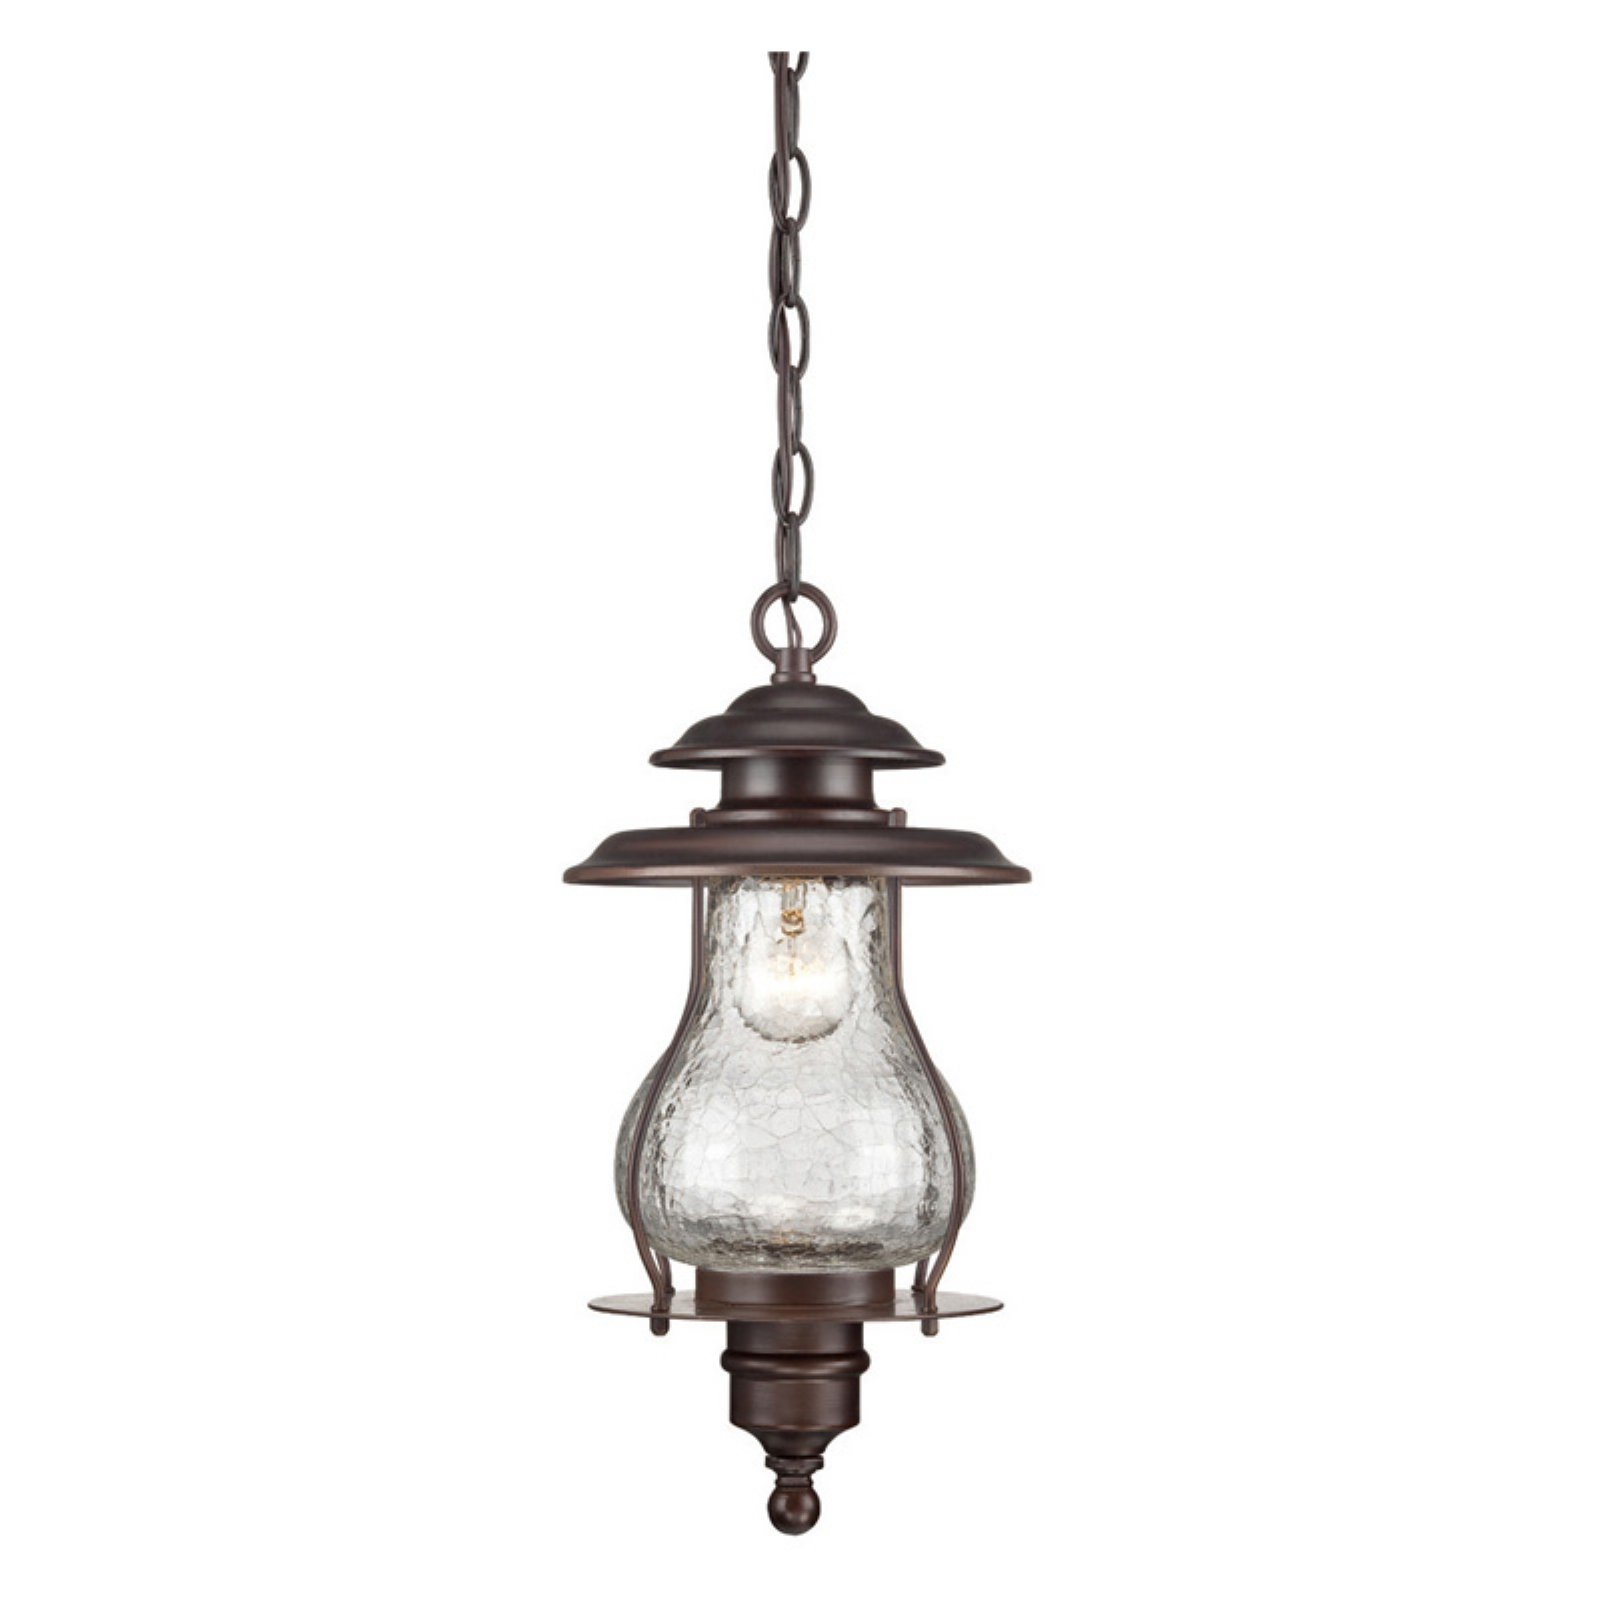 Acclaim lighting blue ridge outdoor hanging lantern light fixture